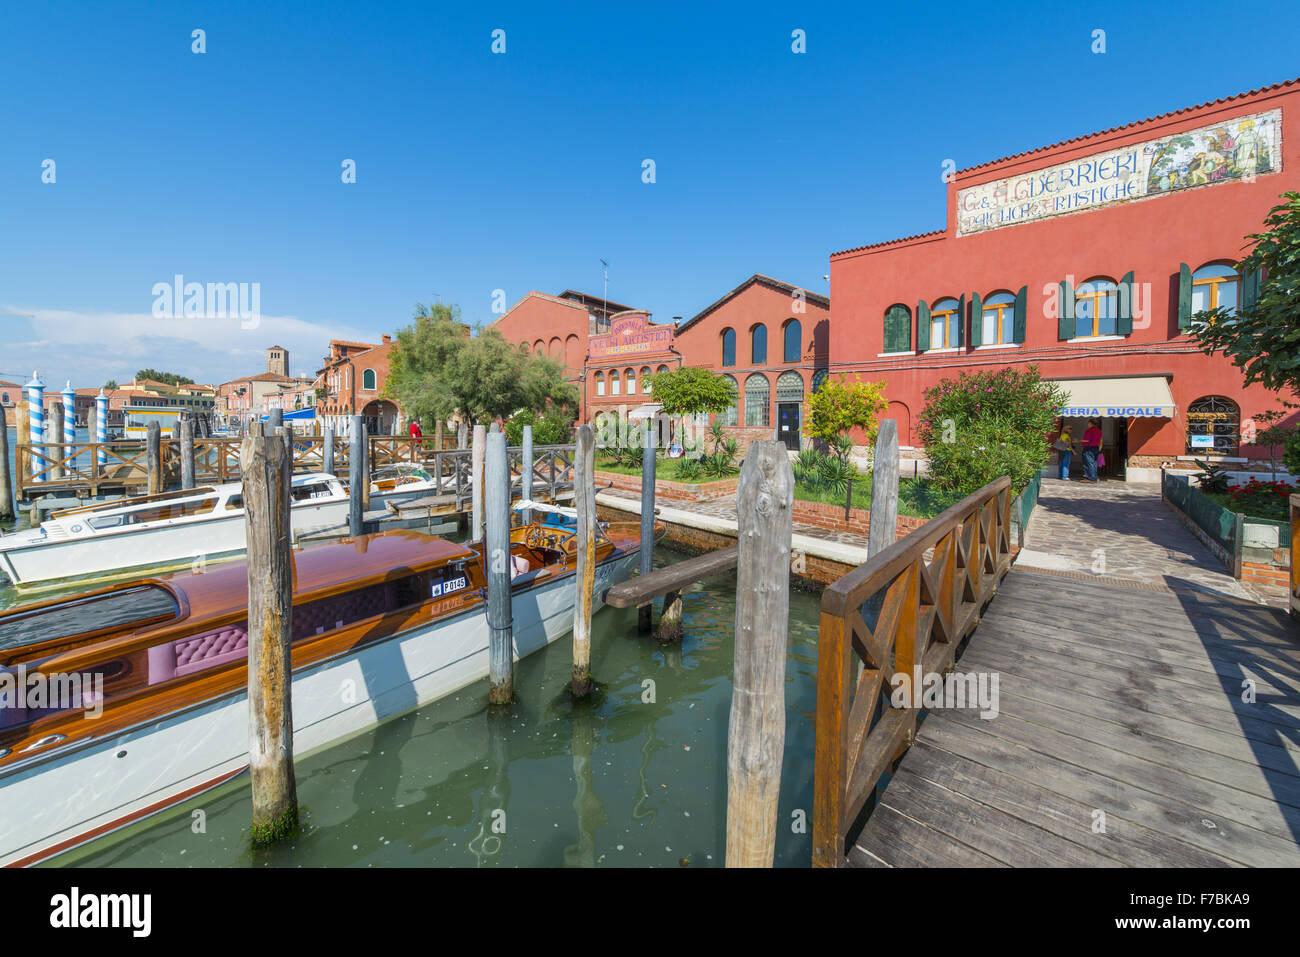 Murano, glass island, Venedig, Venice, Venetia, Italy - Stock Image